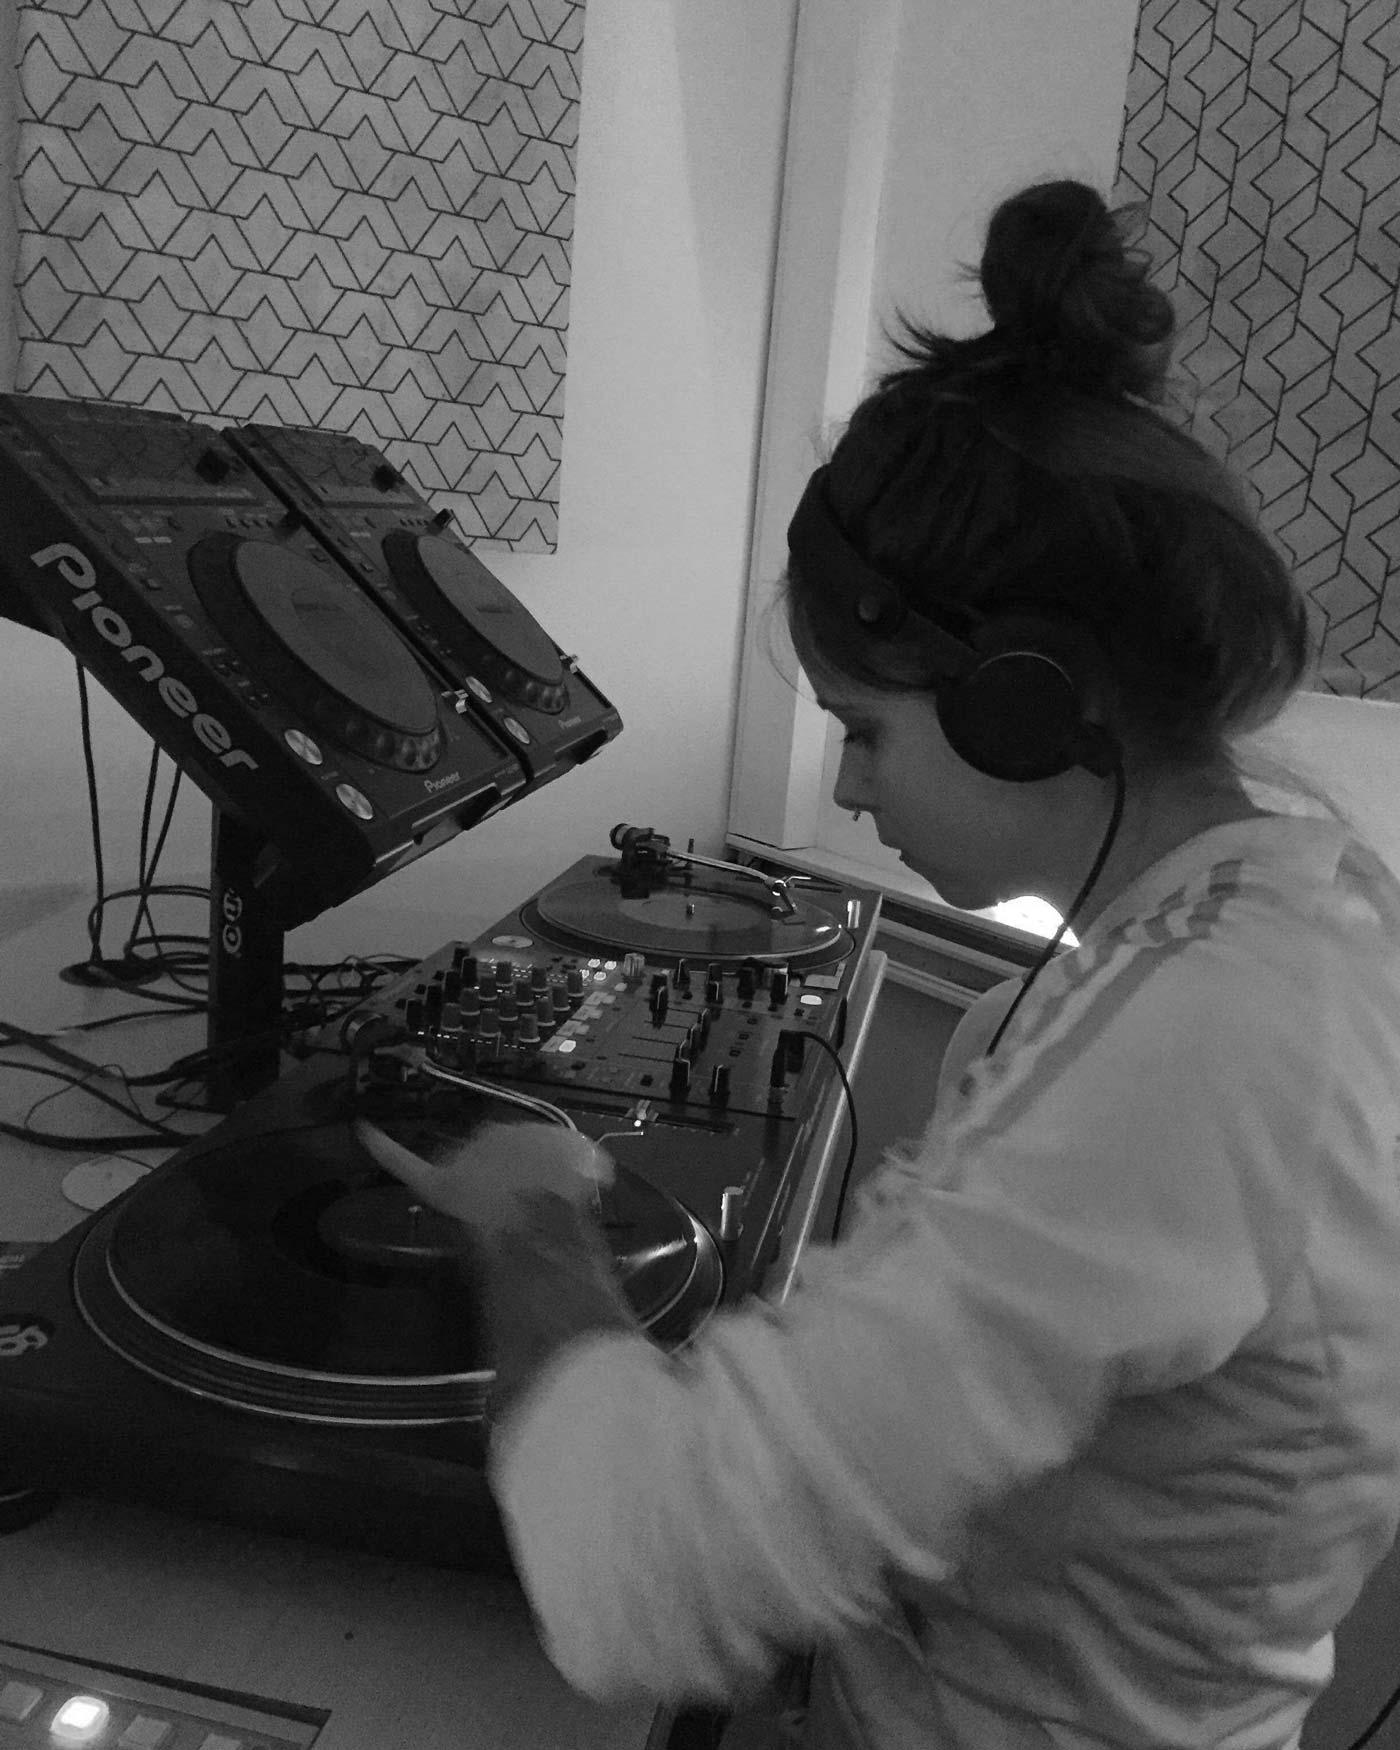 Philo-Drum-and-Bass-Heimgemisch